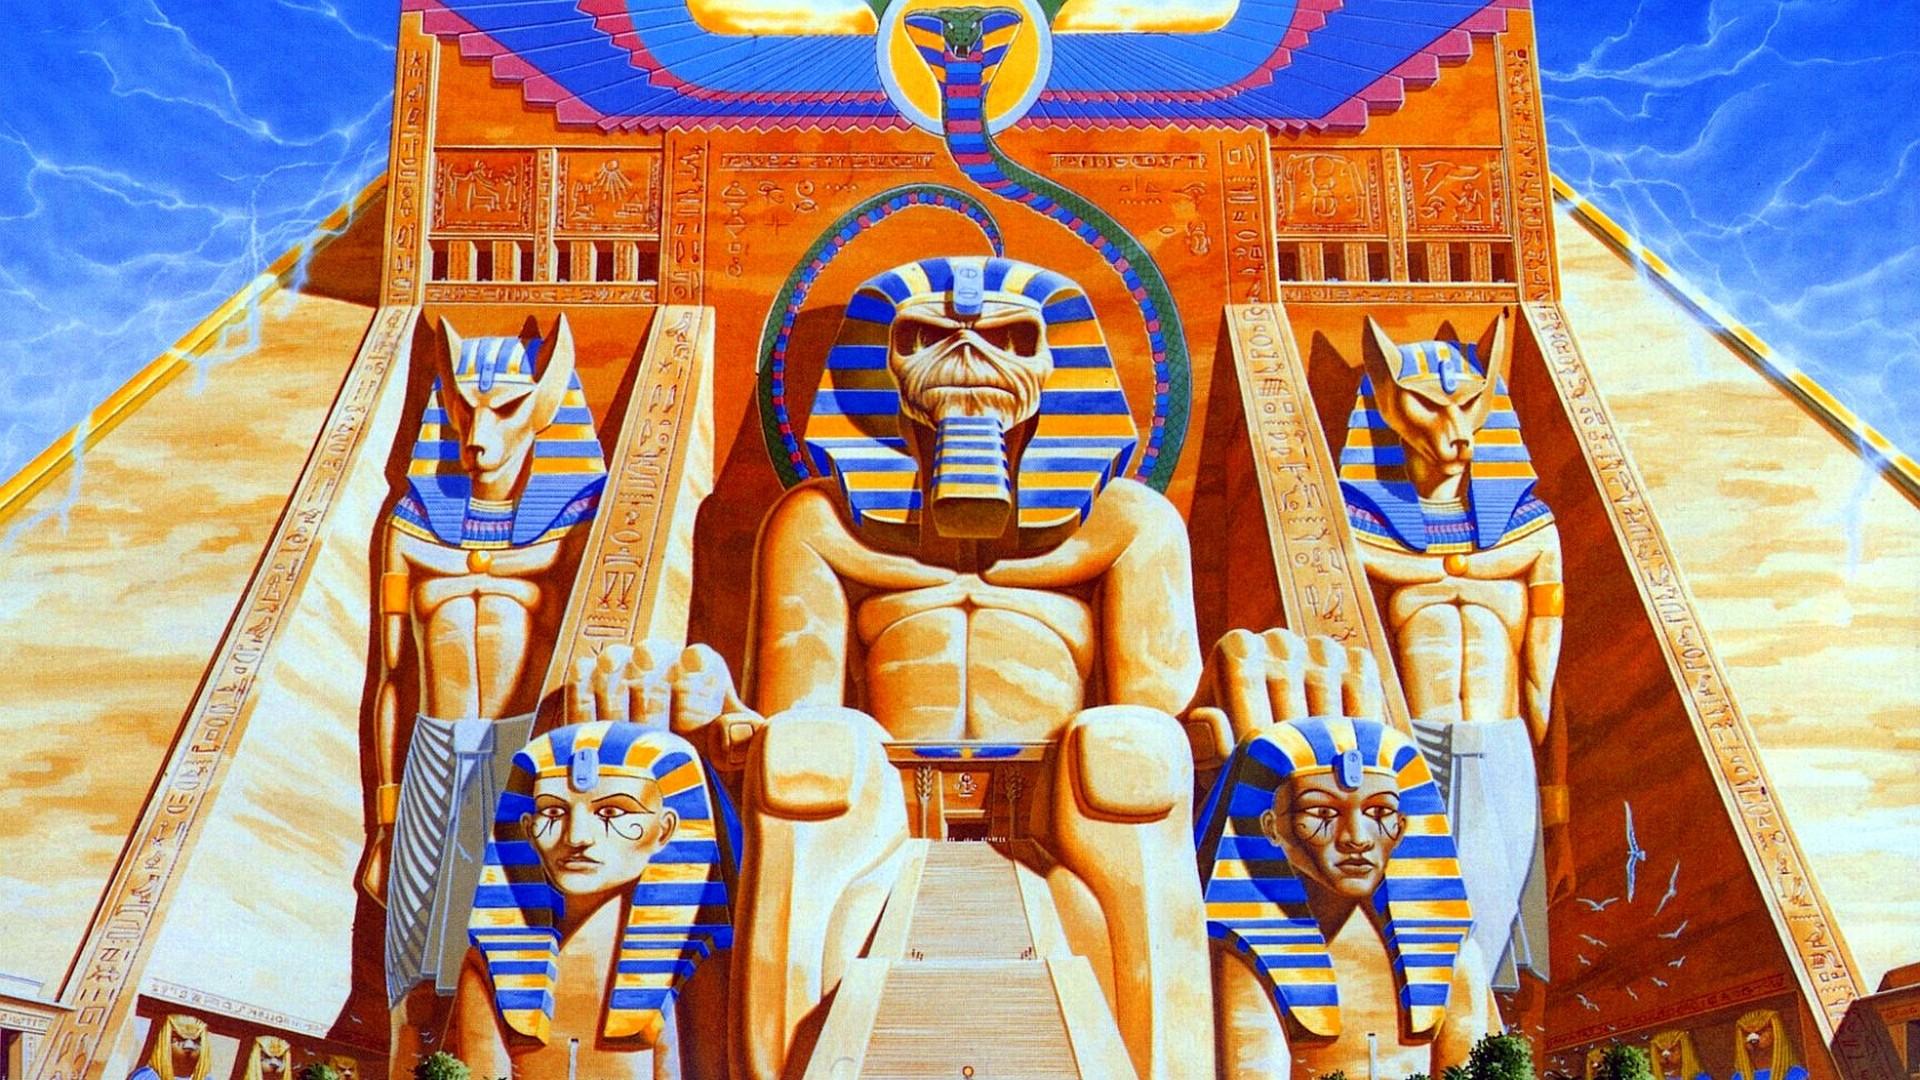 General 1920x1080 album covers cover art pyramid Iron Maiden music Egypt sphinx artwork band musician Eddie